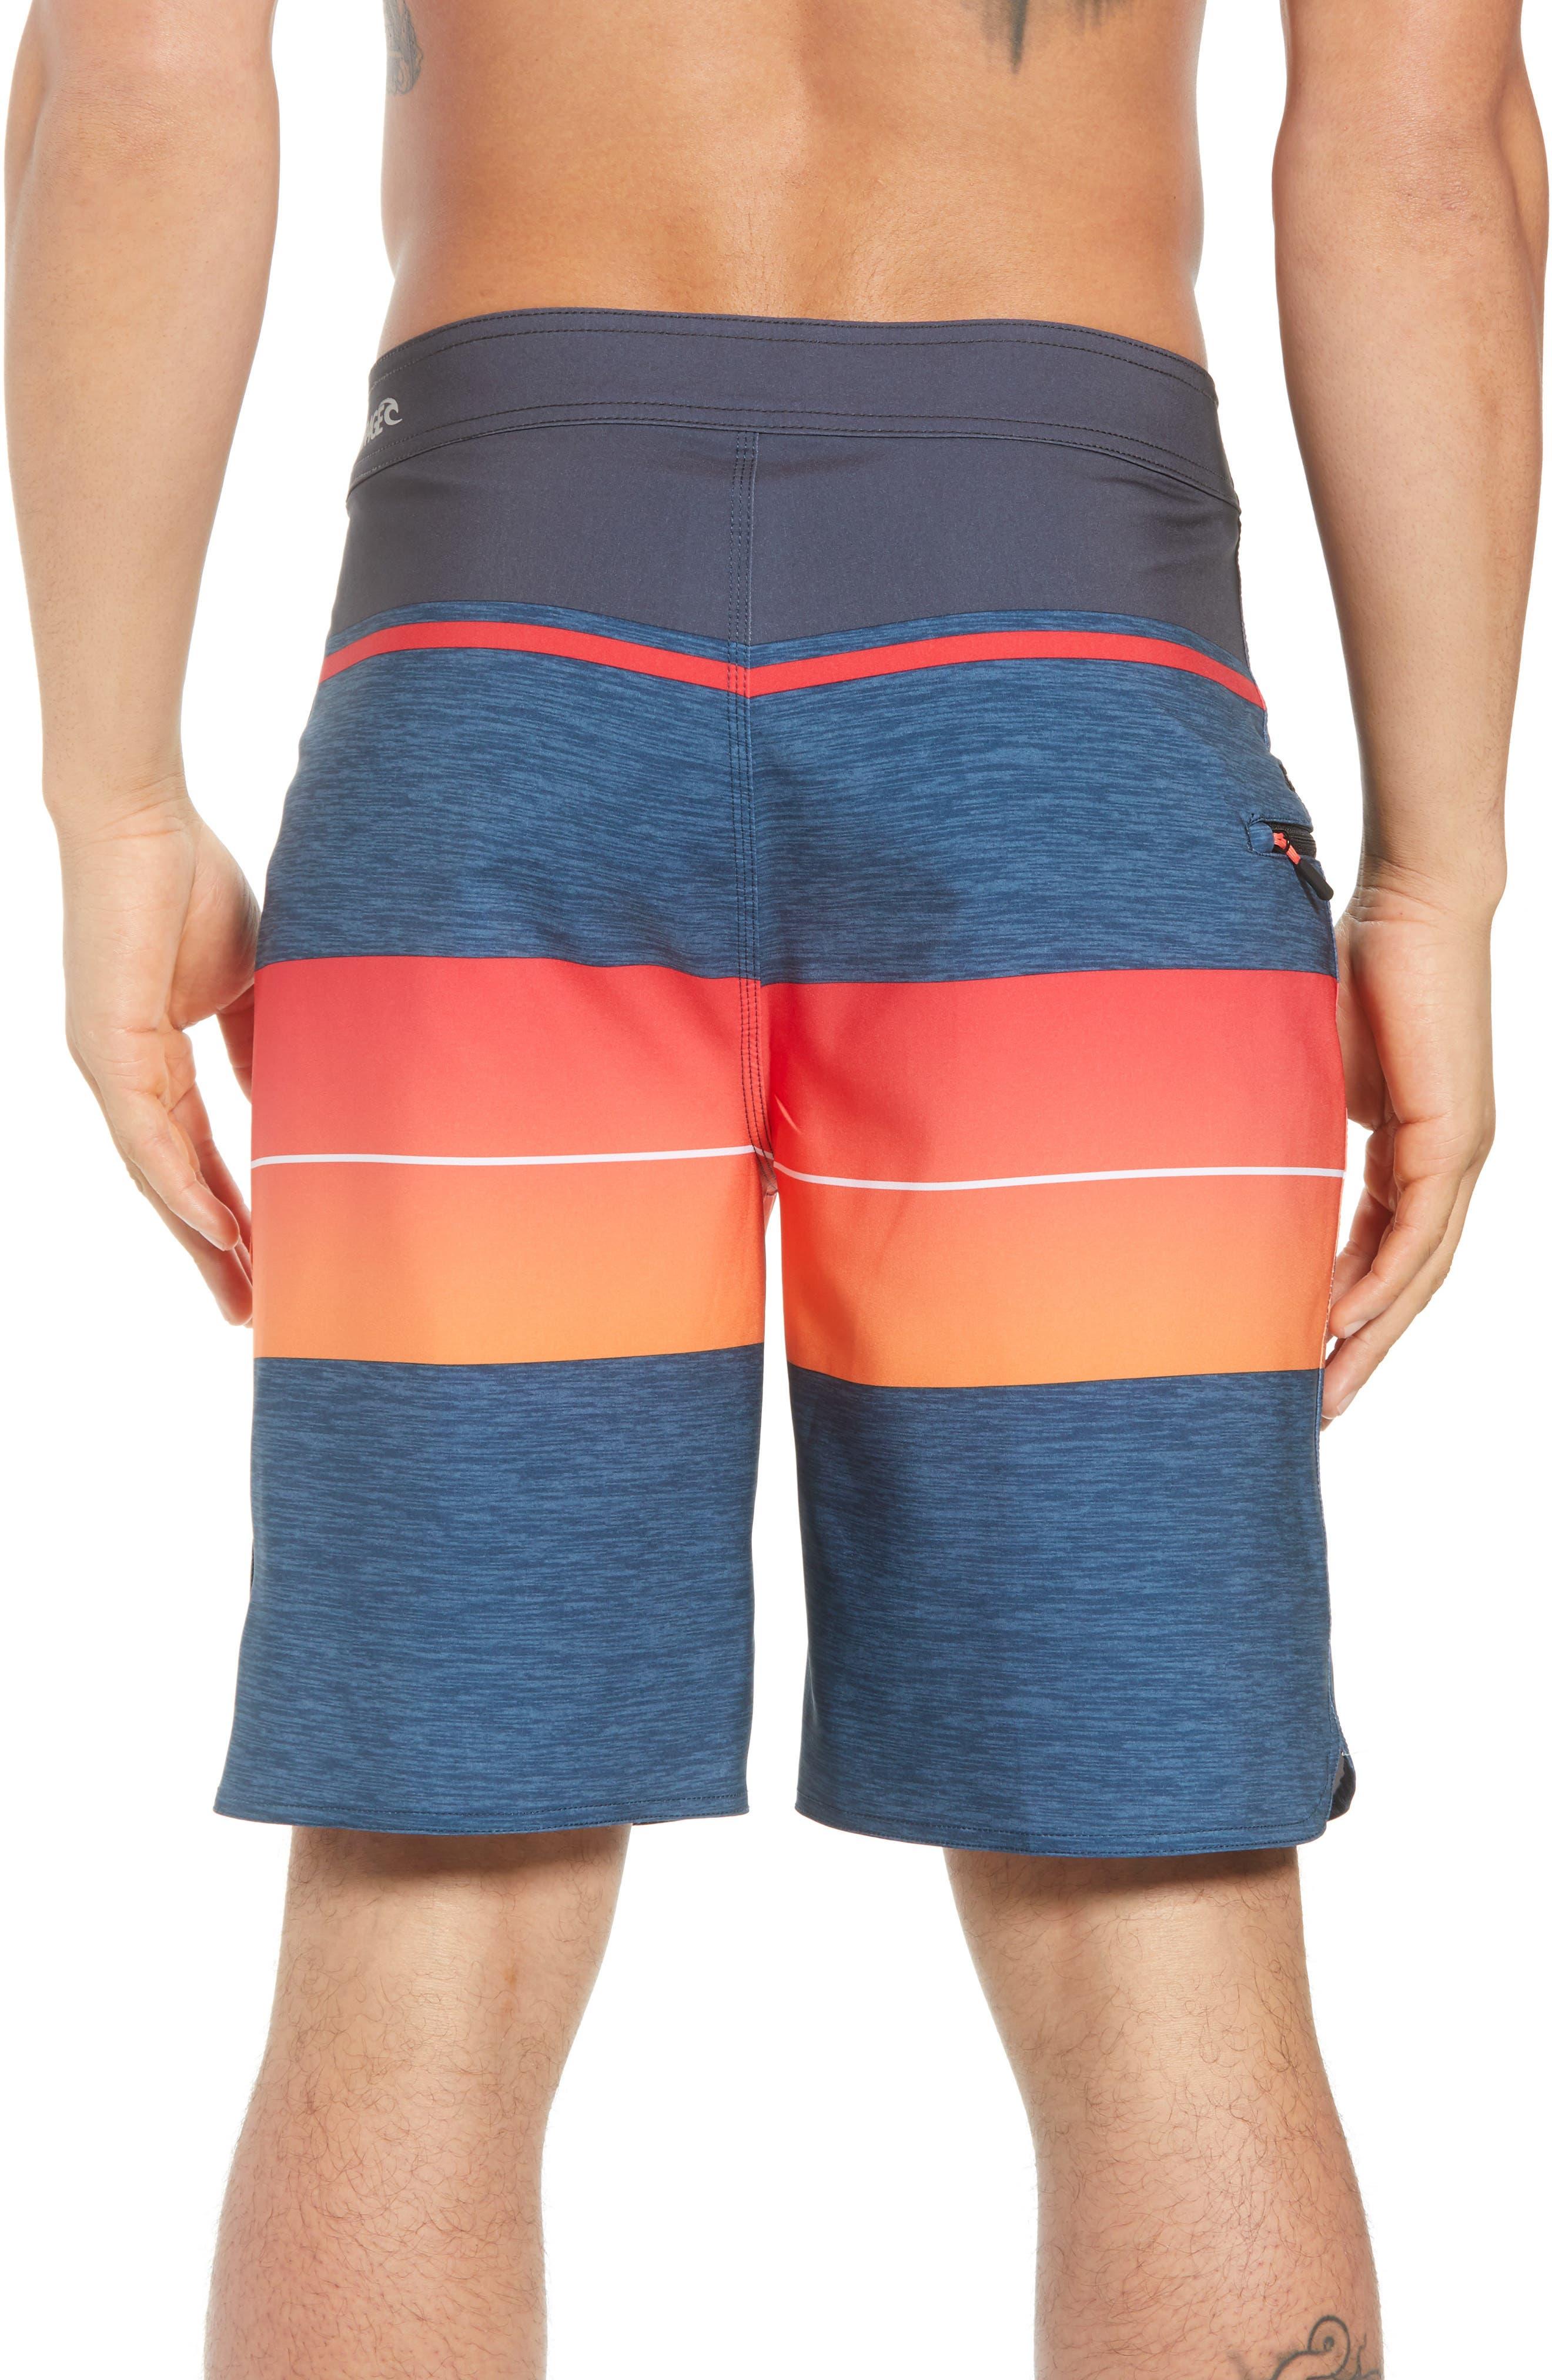 Mirage Eclipse Board Shorts,                             Alternate thumbnail 2, color,                             Orange